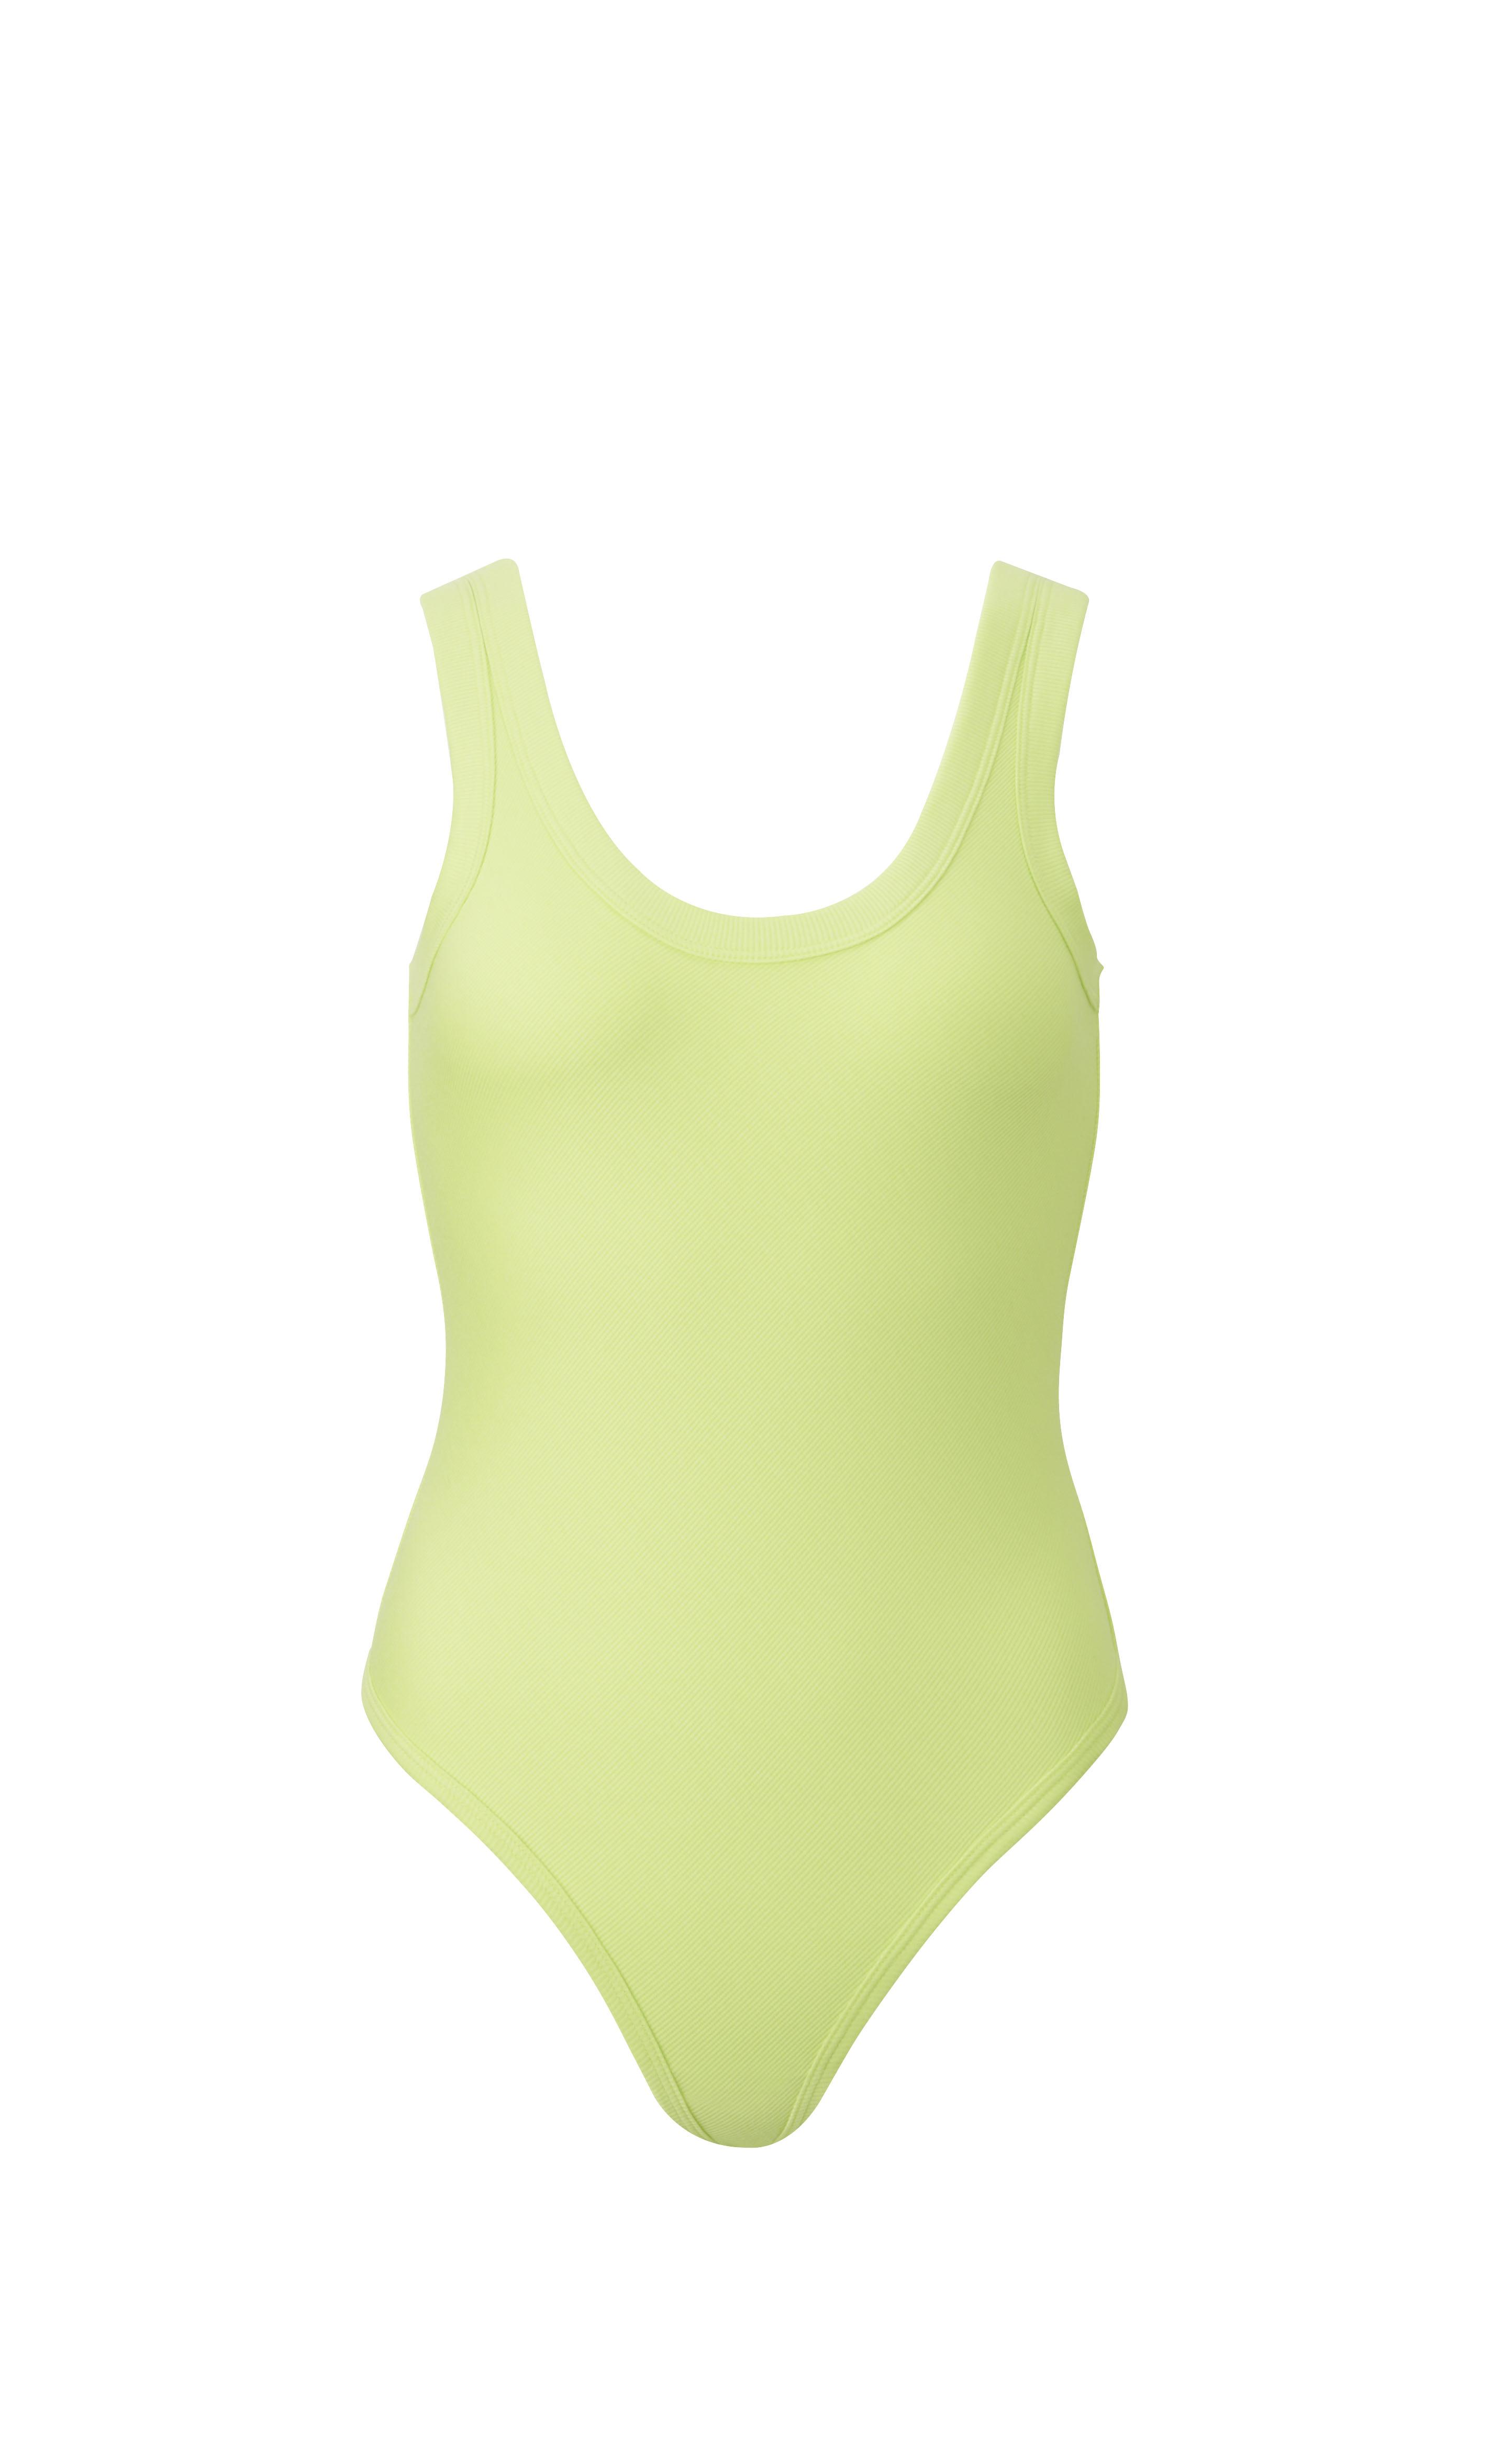 d1b8ee5745 Alexander Wang x Uniqlo Women Heattech Ribbed Sleeveless Bodysuit